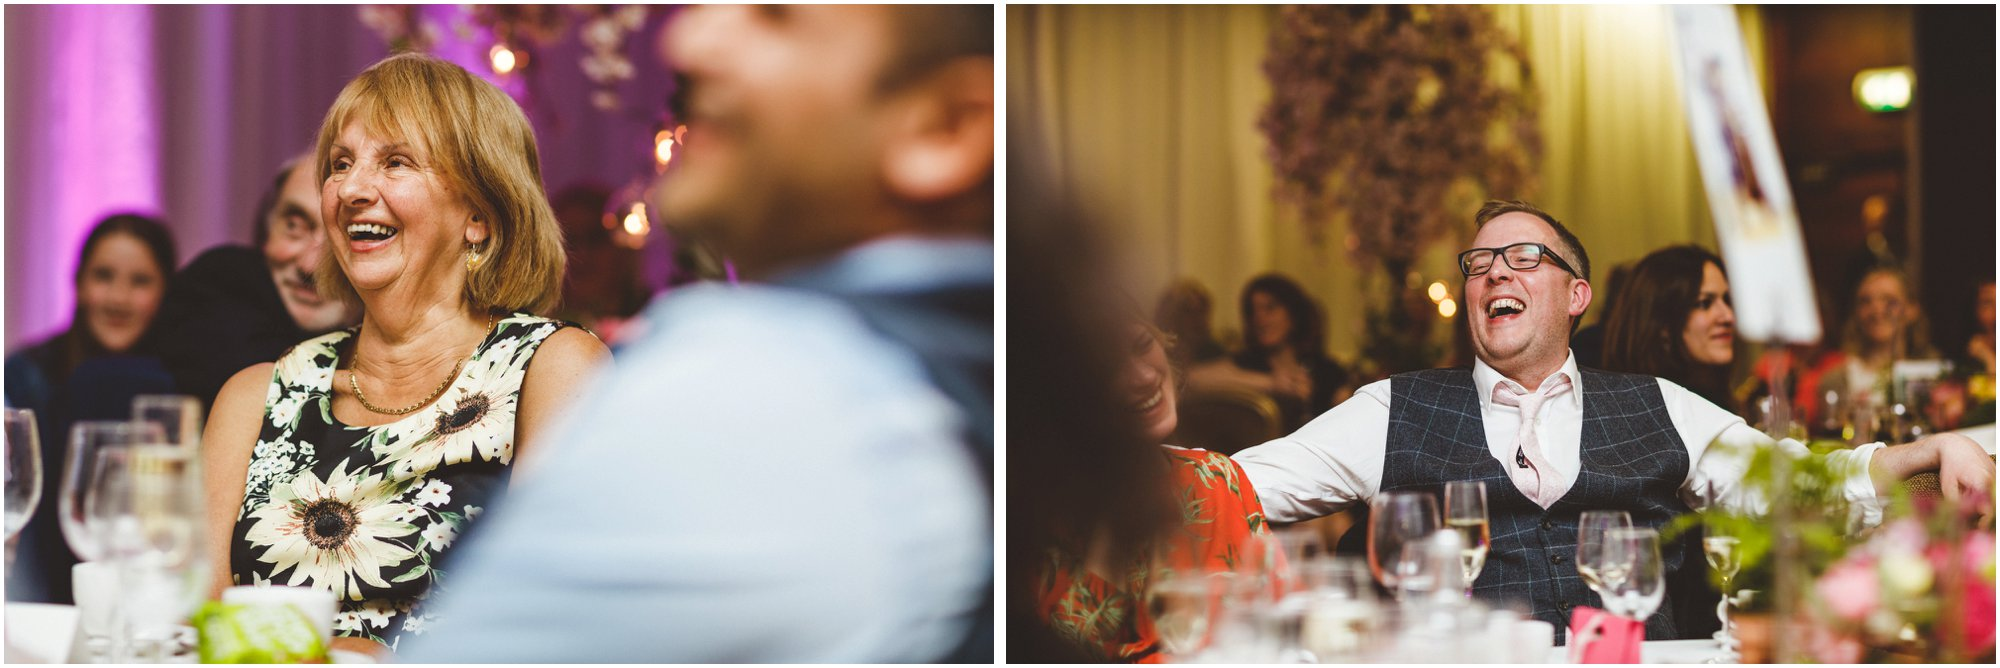 mecure-sheffield-st-pauls-wedding_0167.jpg